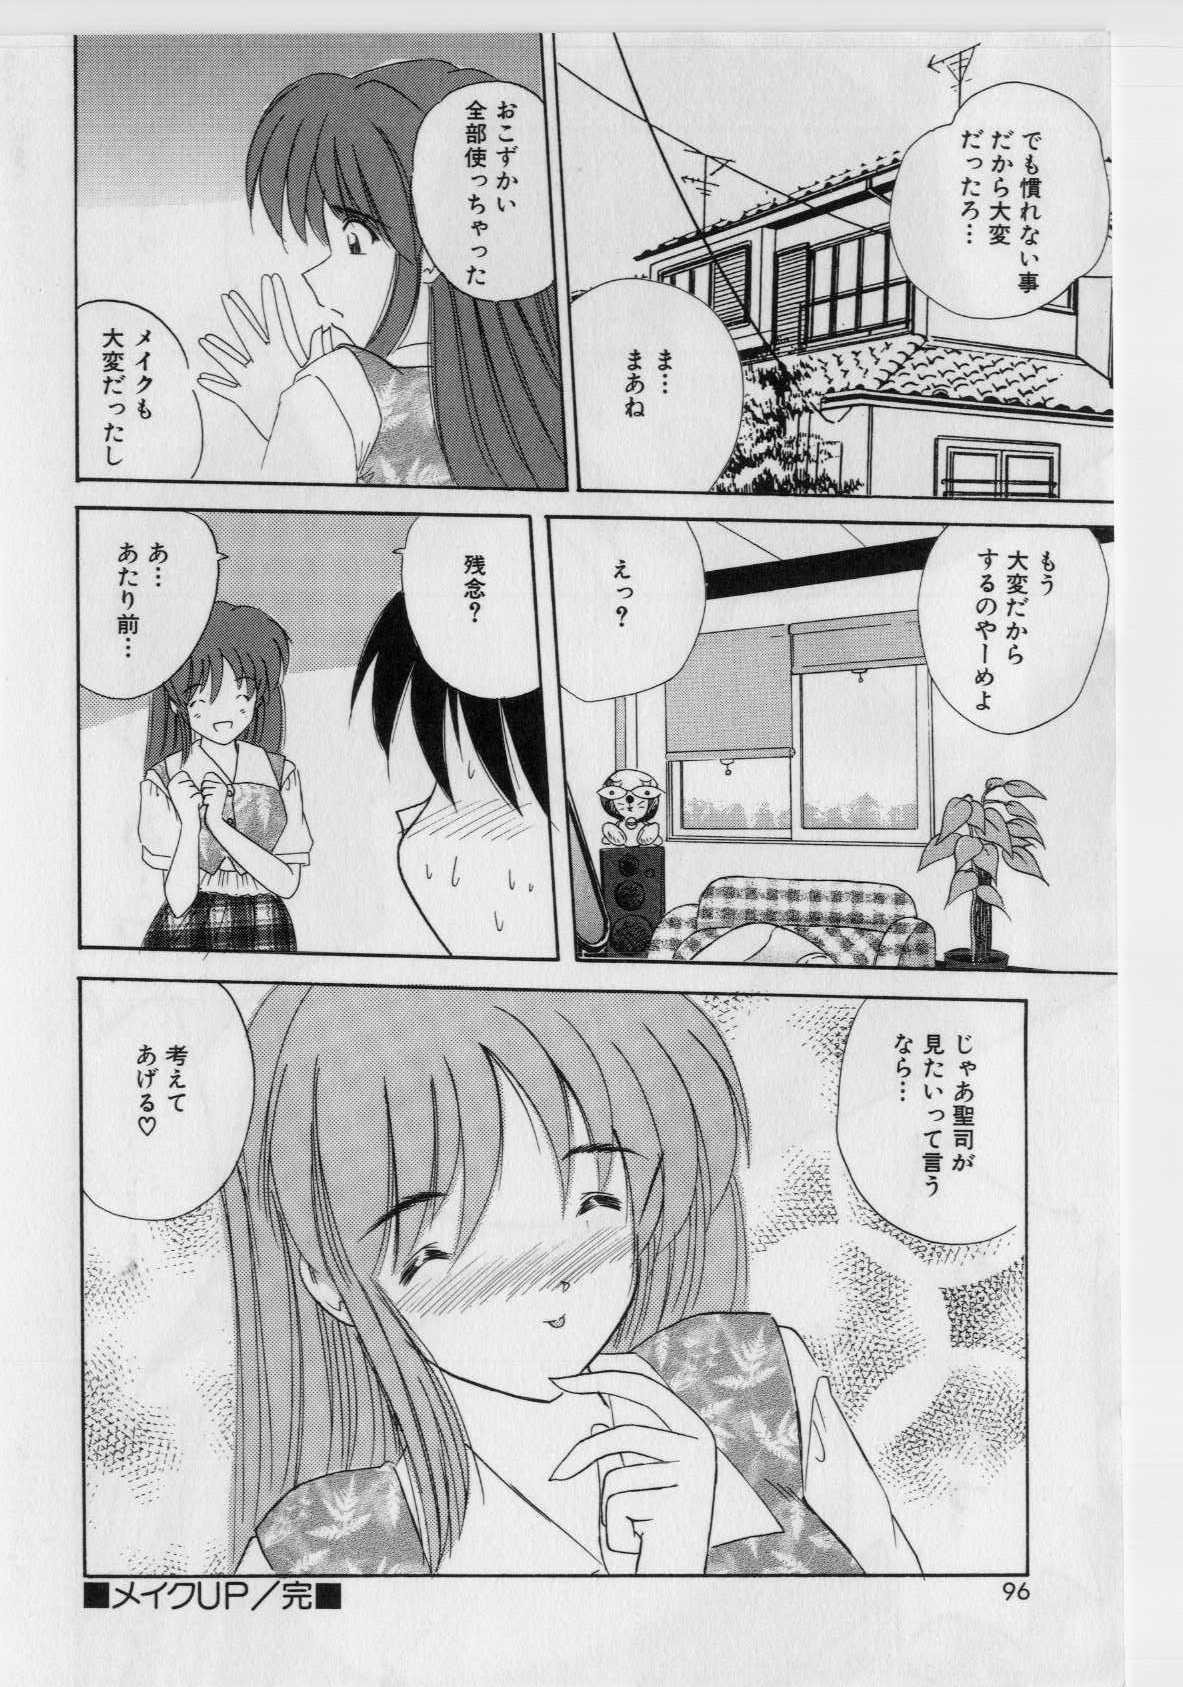 Ikenai Peach 93